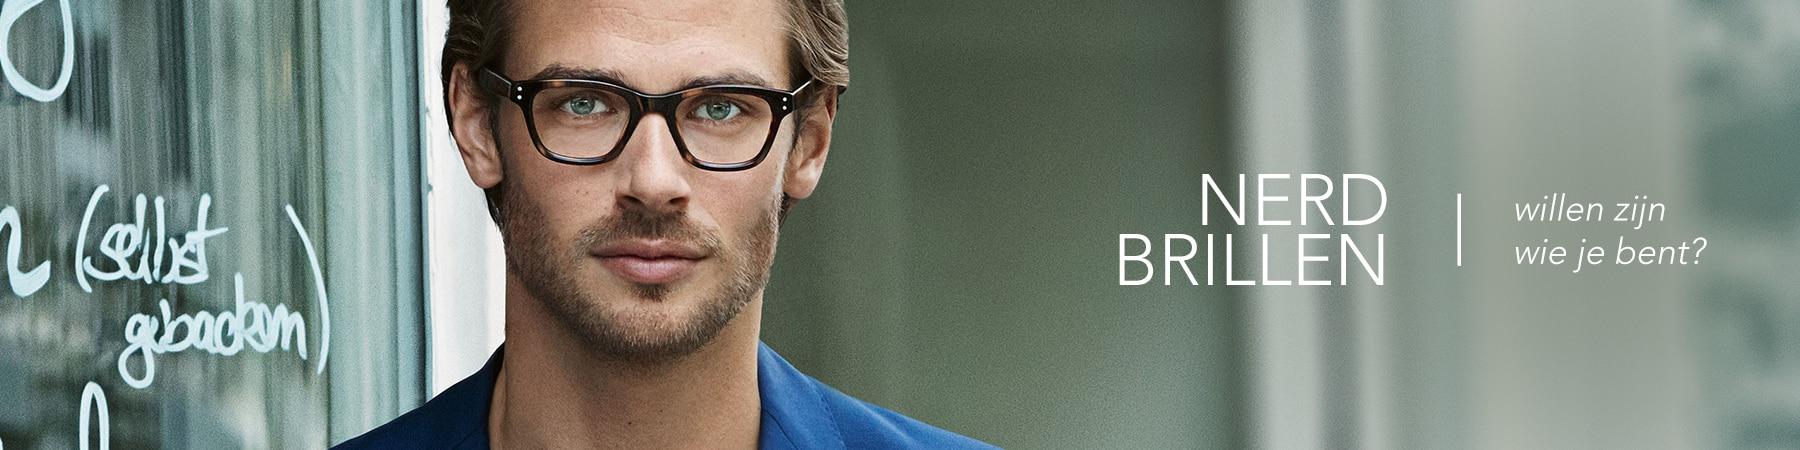 nerd brillen